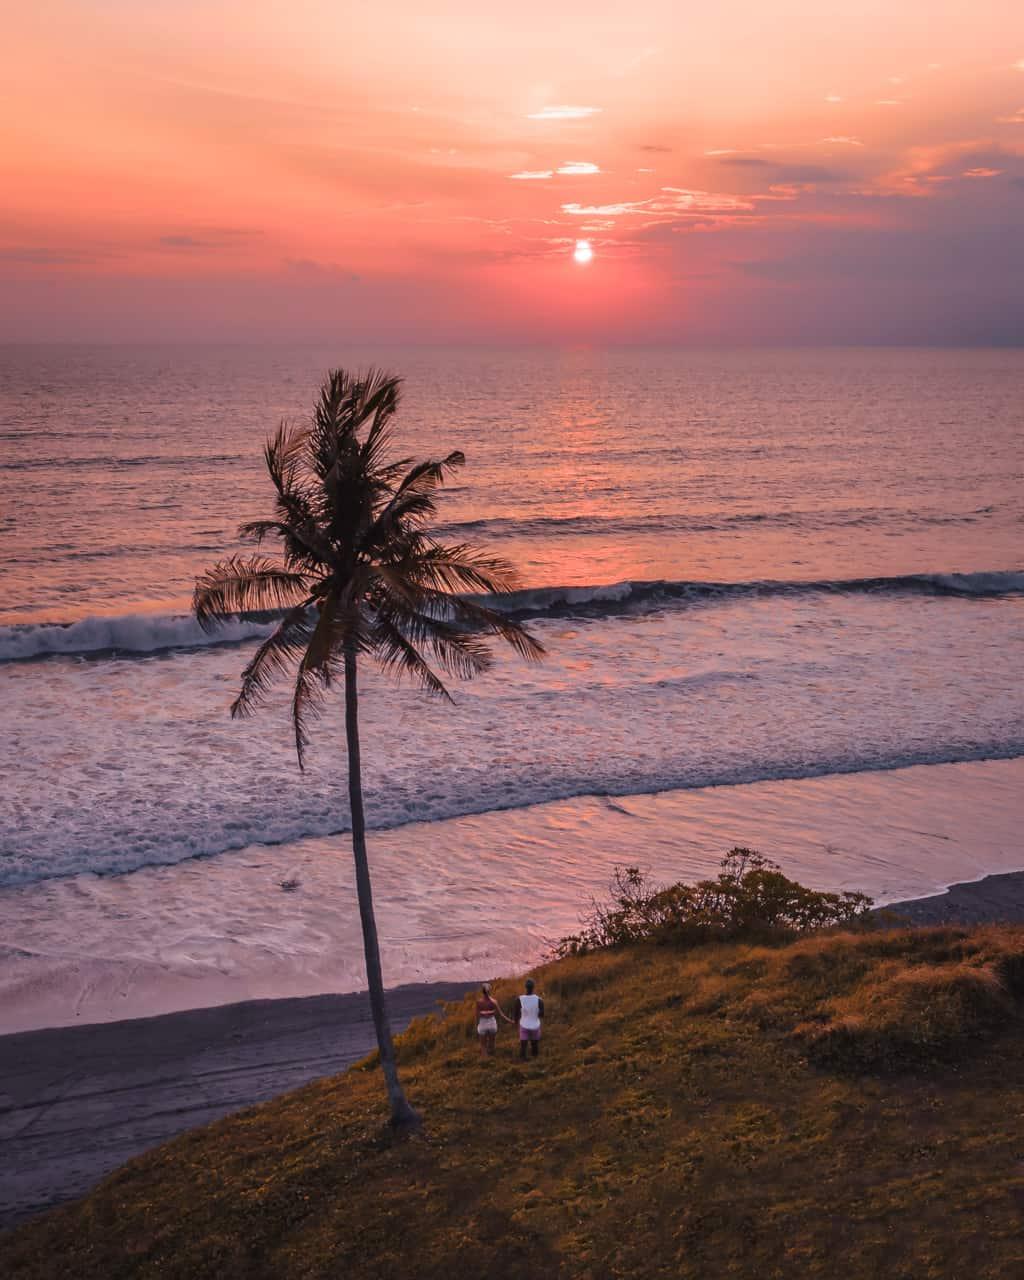 sunset-pigstone-beach-bali